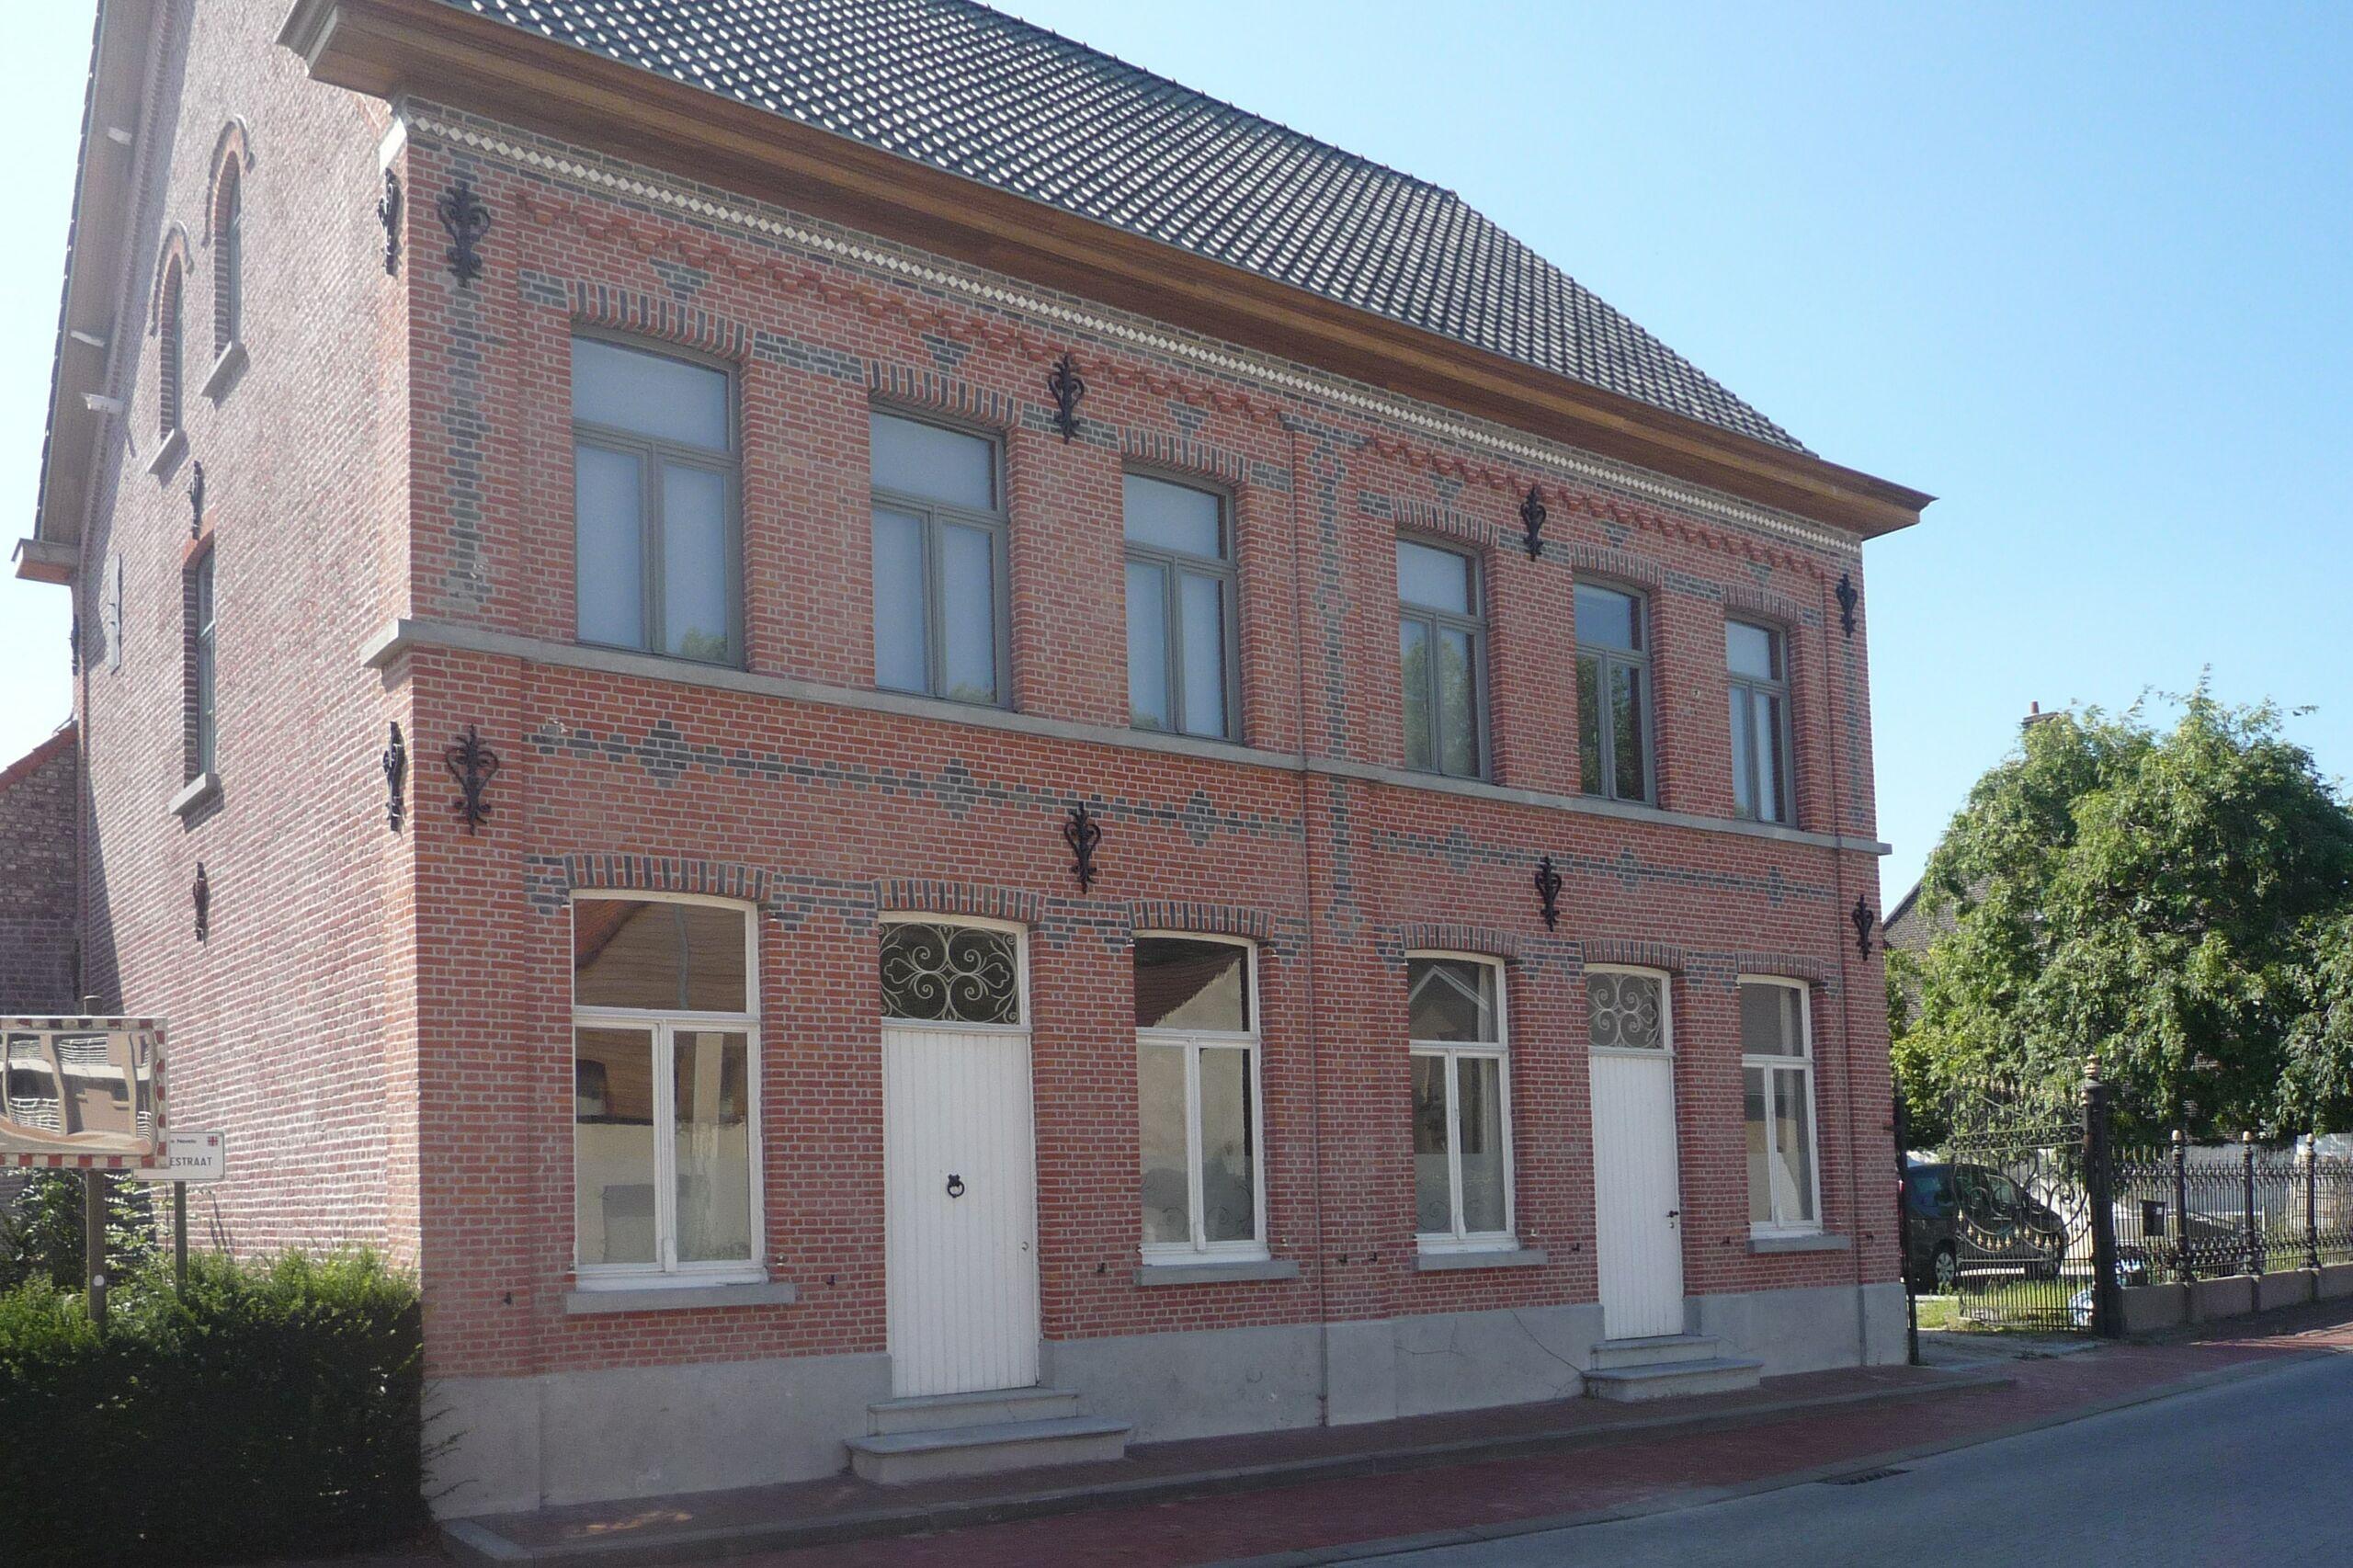 mix1 uai | Baeyens & Beck architecten Gent | architect nieuwbouw renovatie interieur | high end | architectenbureau